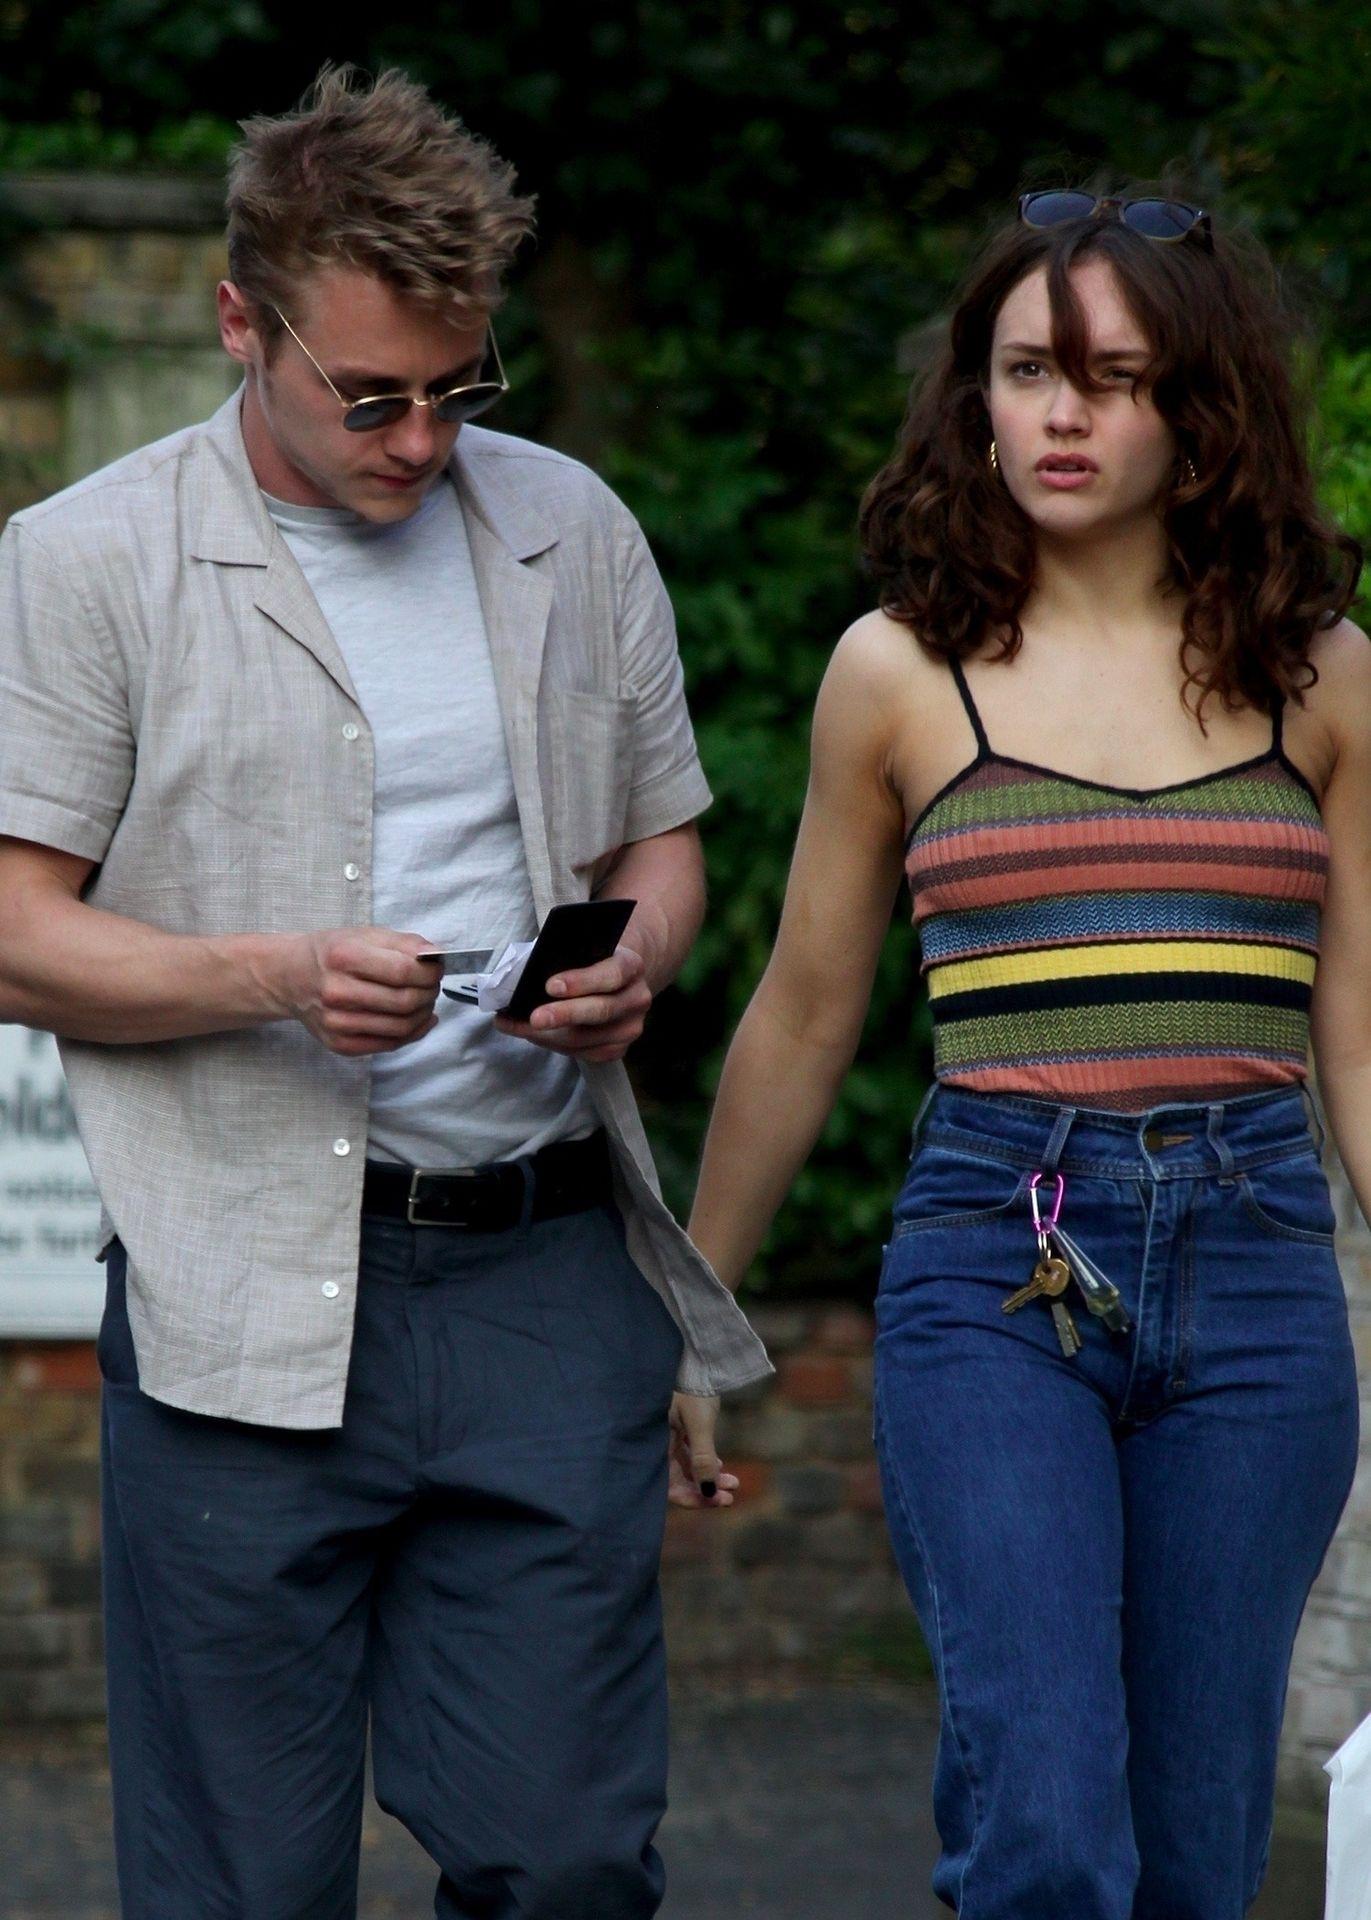 Ben Hardy Walks Hand In Hand With Actress Girlfriend Olivia Cooke 0007